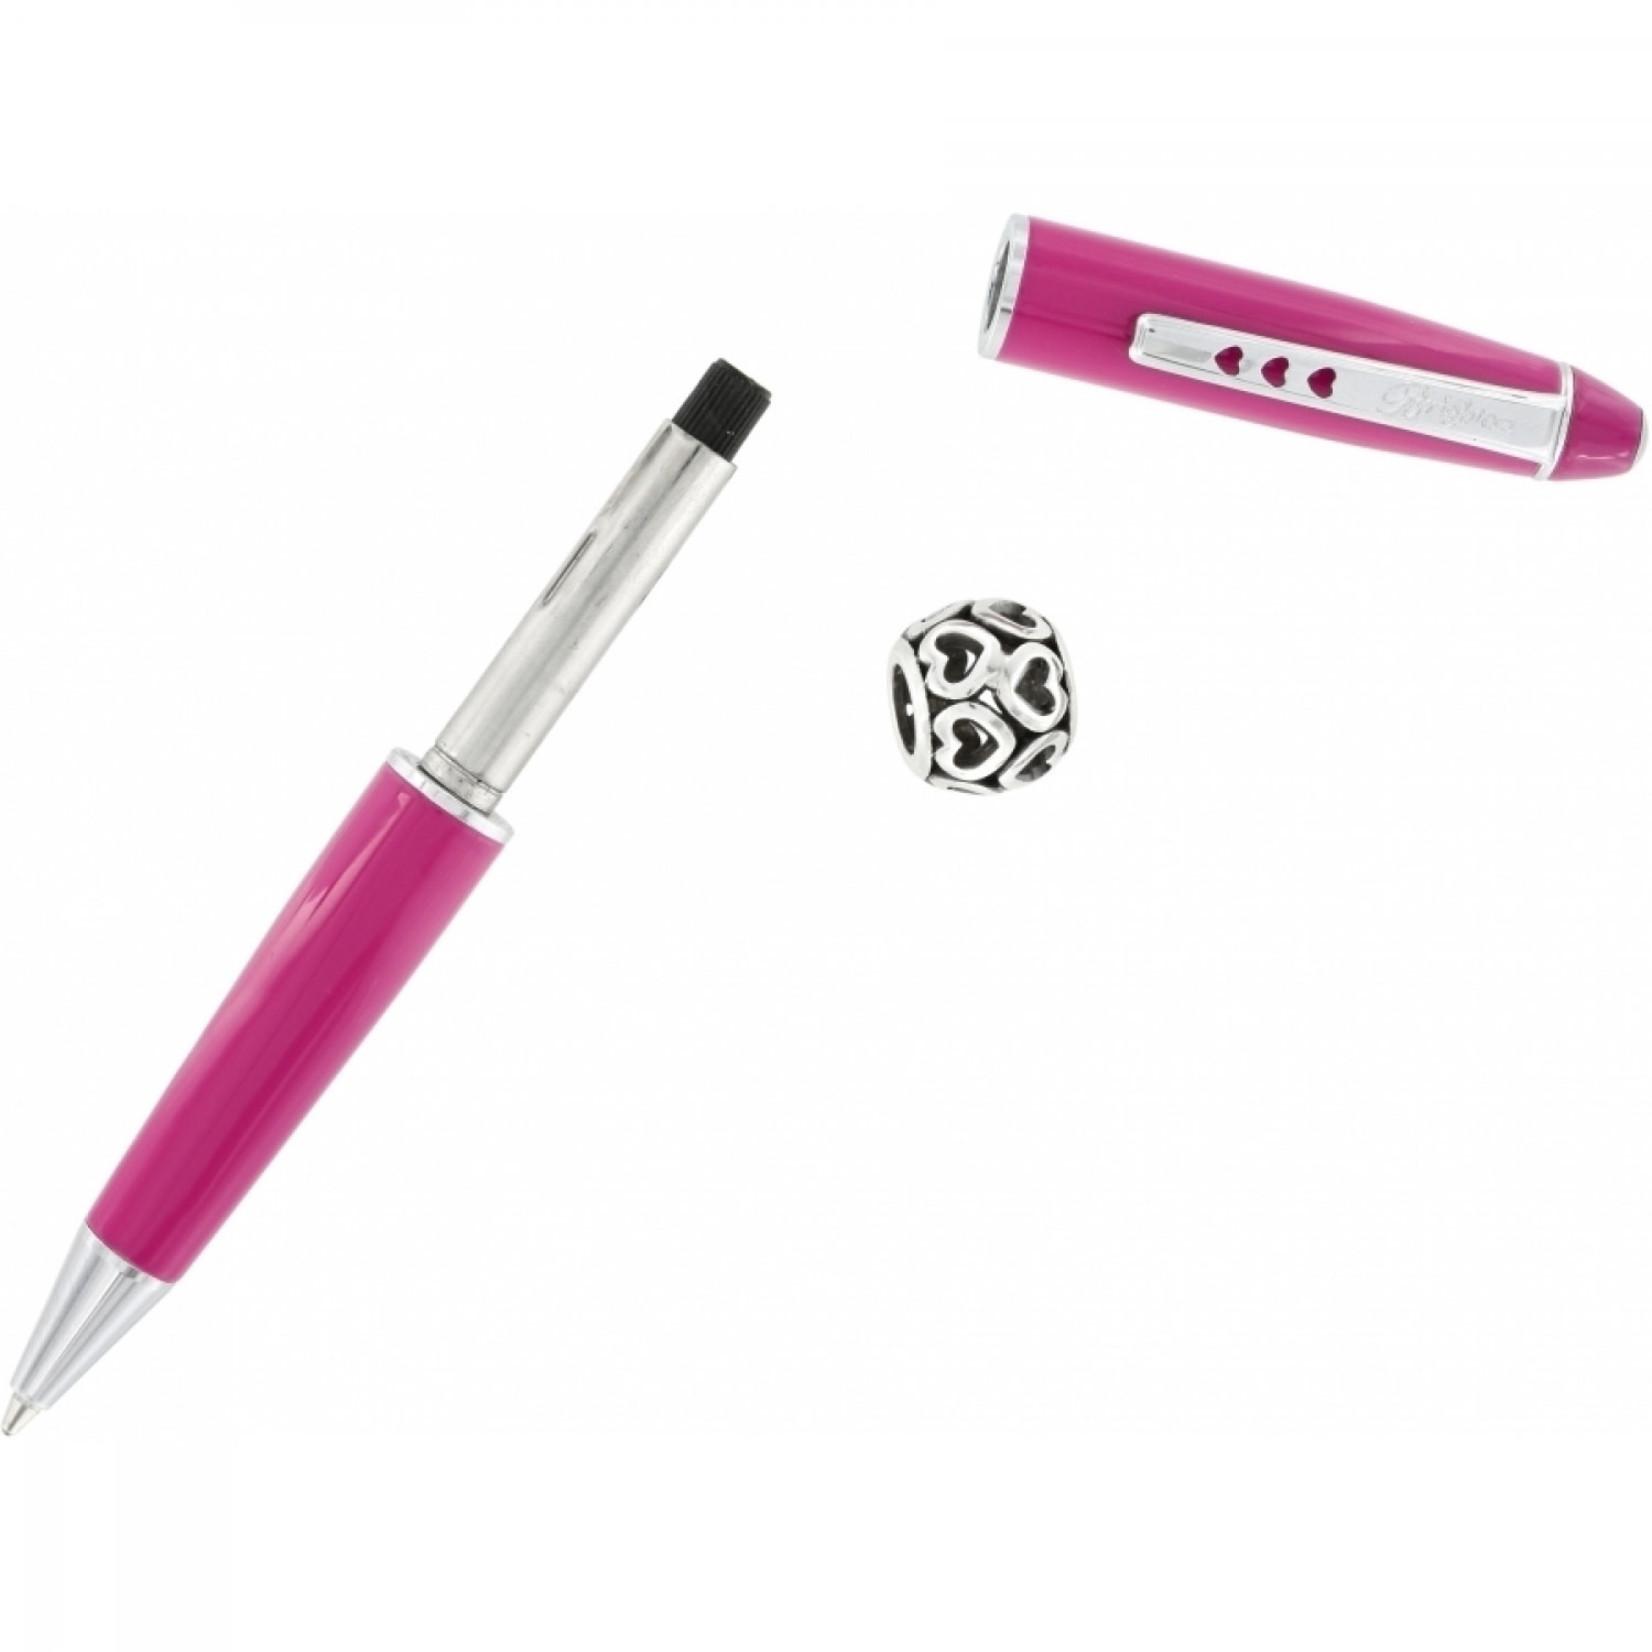 Brighton J97207 Pen Pal Short Charm Pen - Pink/Silver